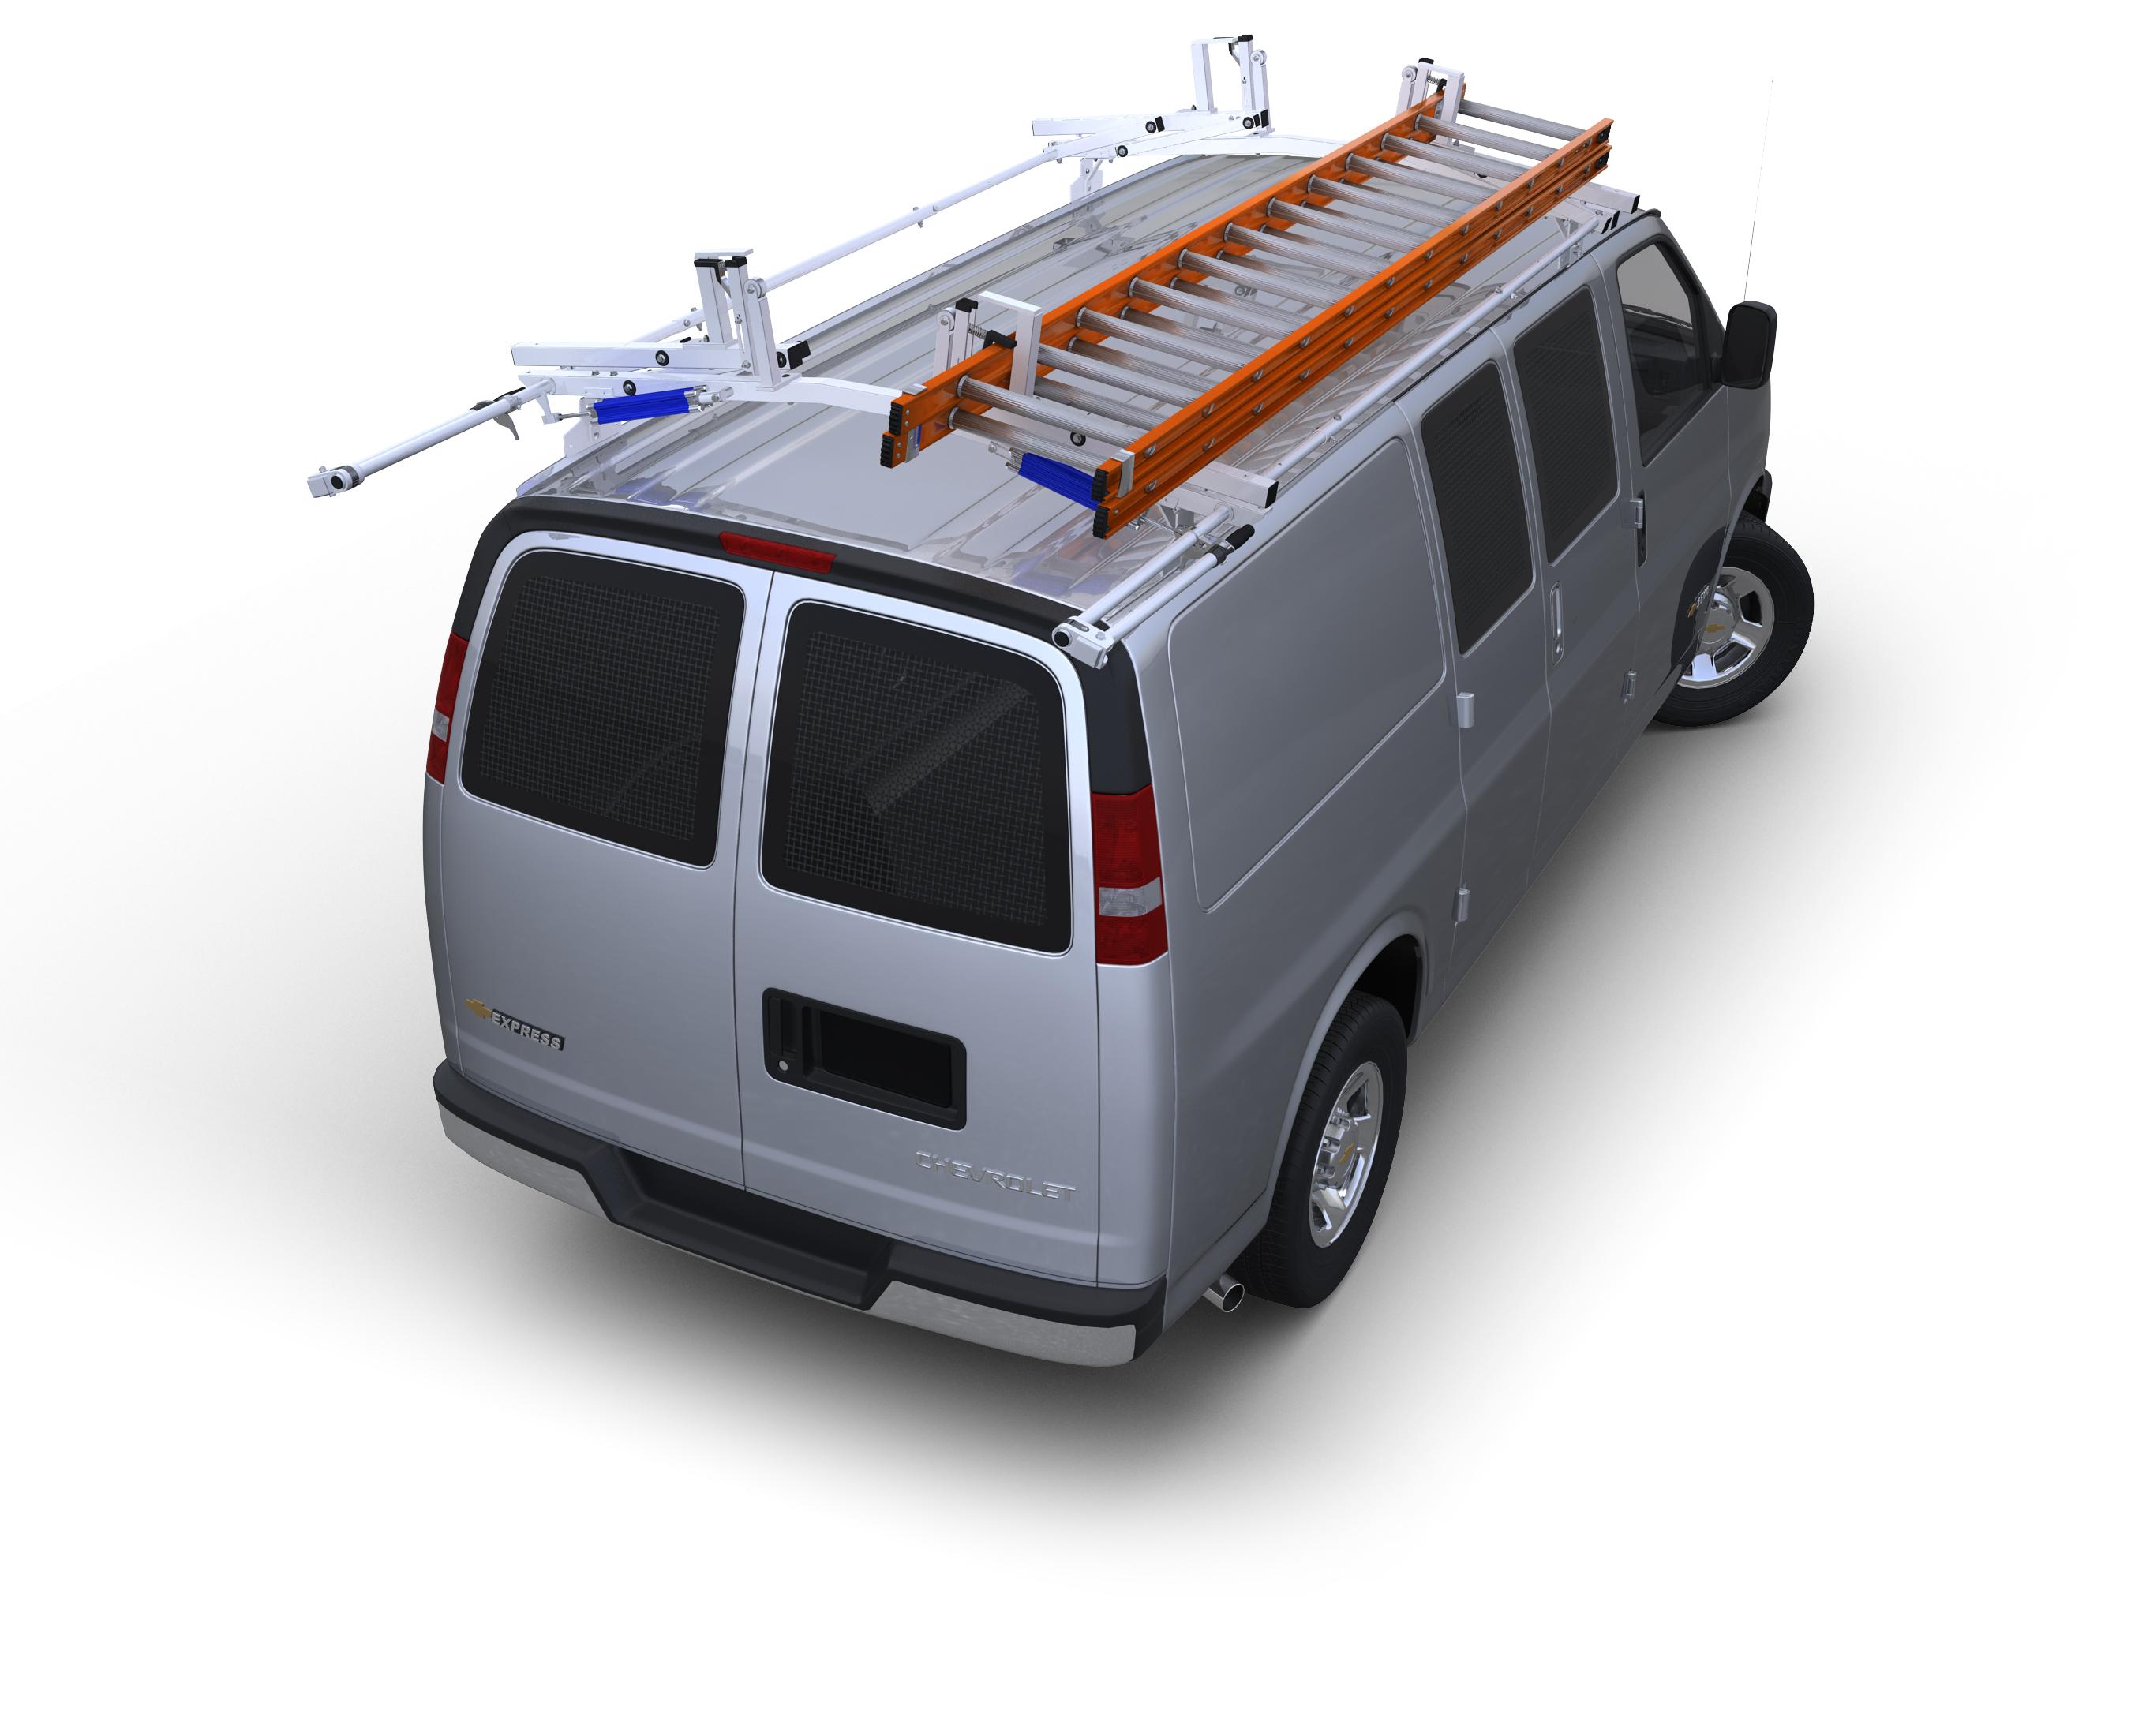 2014 & Newer Transit Connect Long WB Plumbing Van Package, Steel Shelving - SAVE $100!